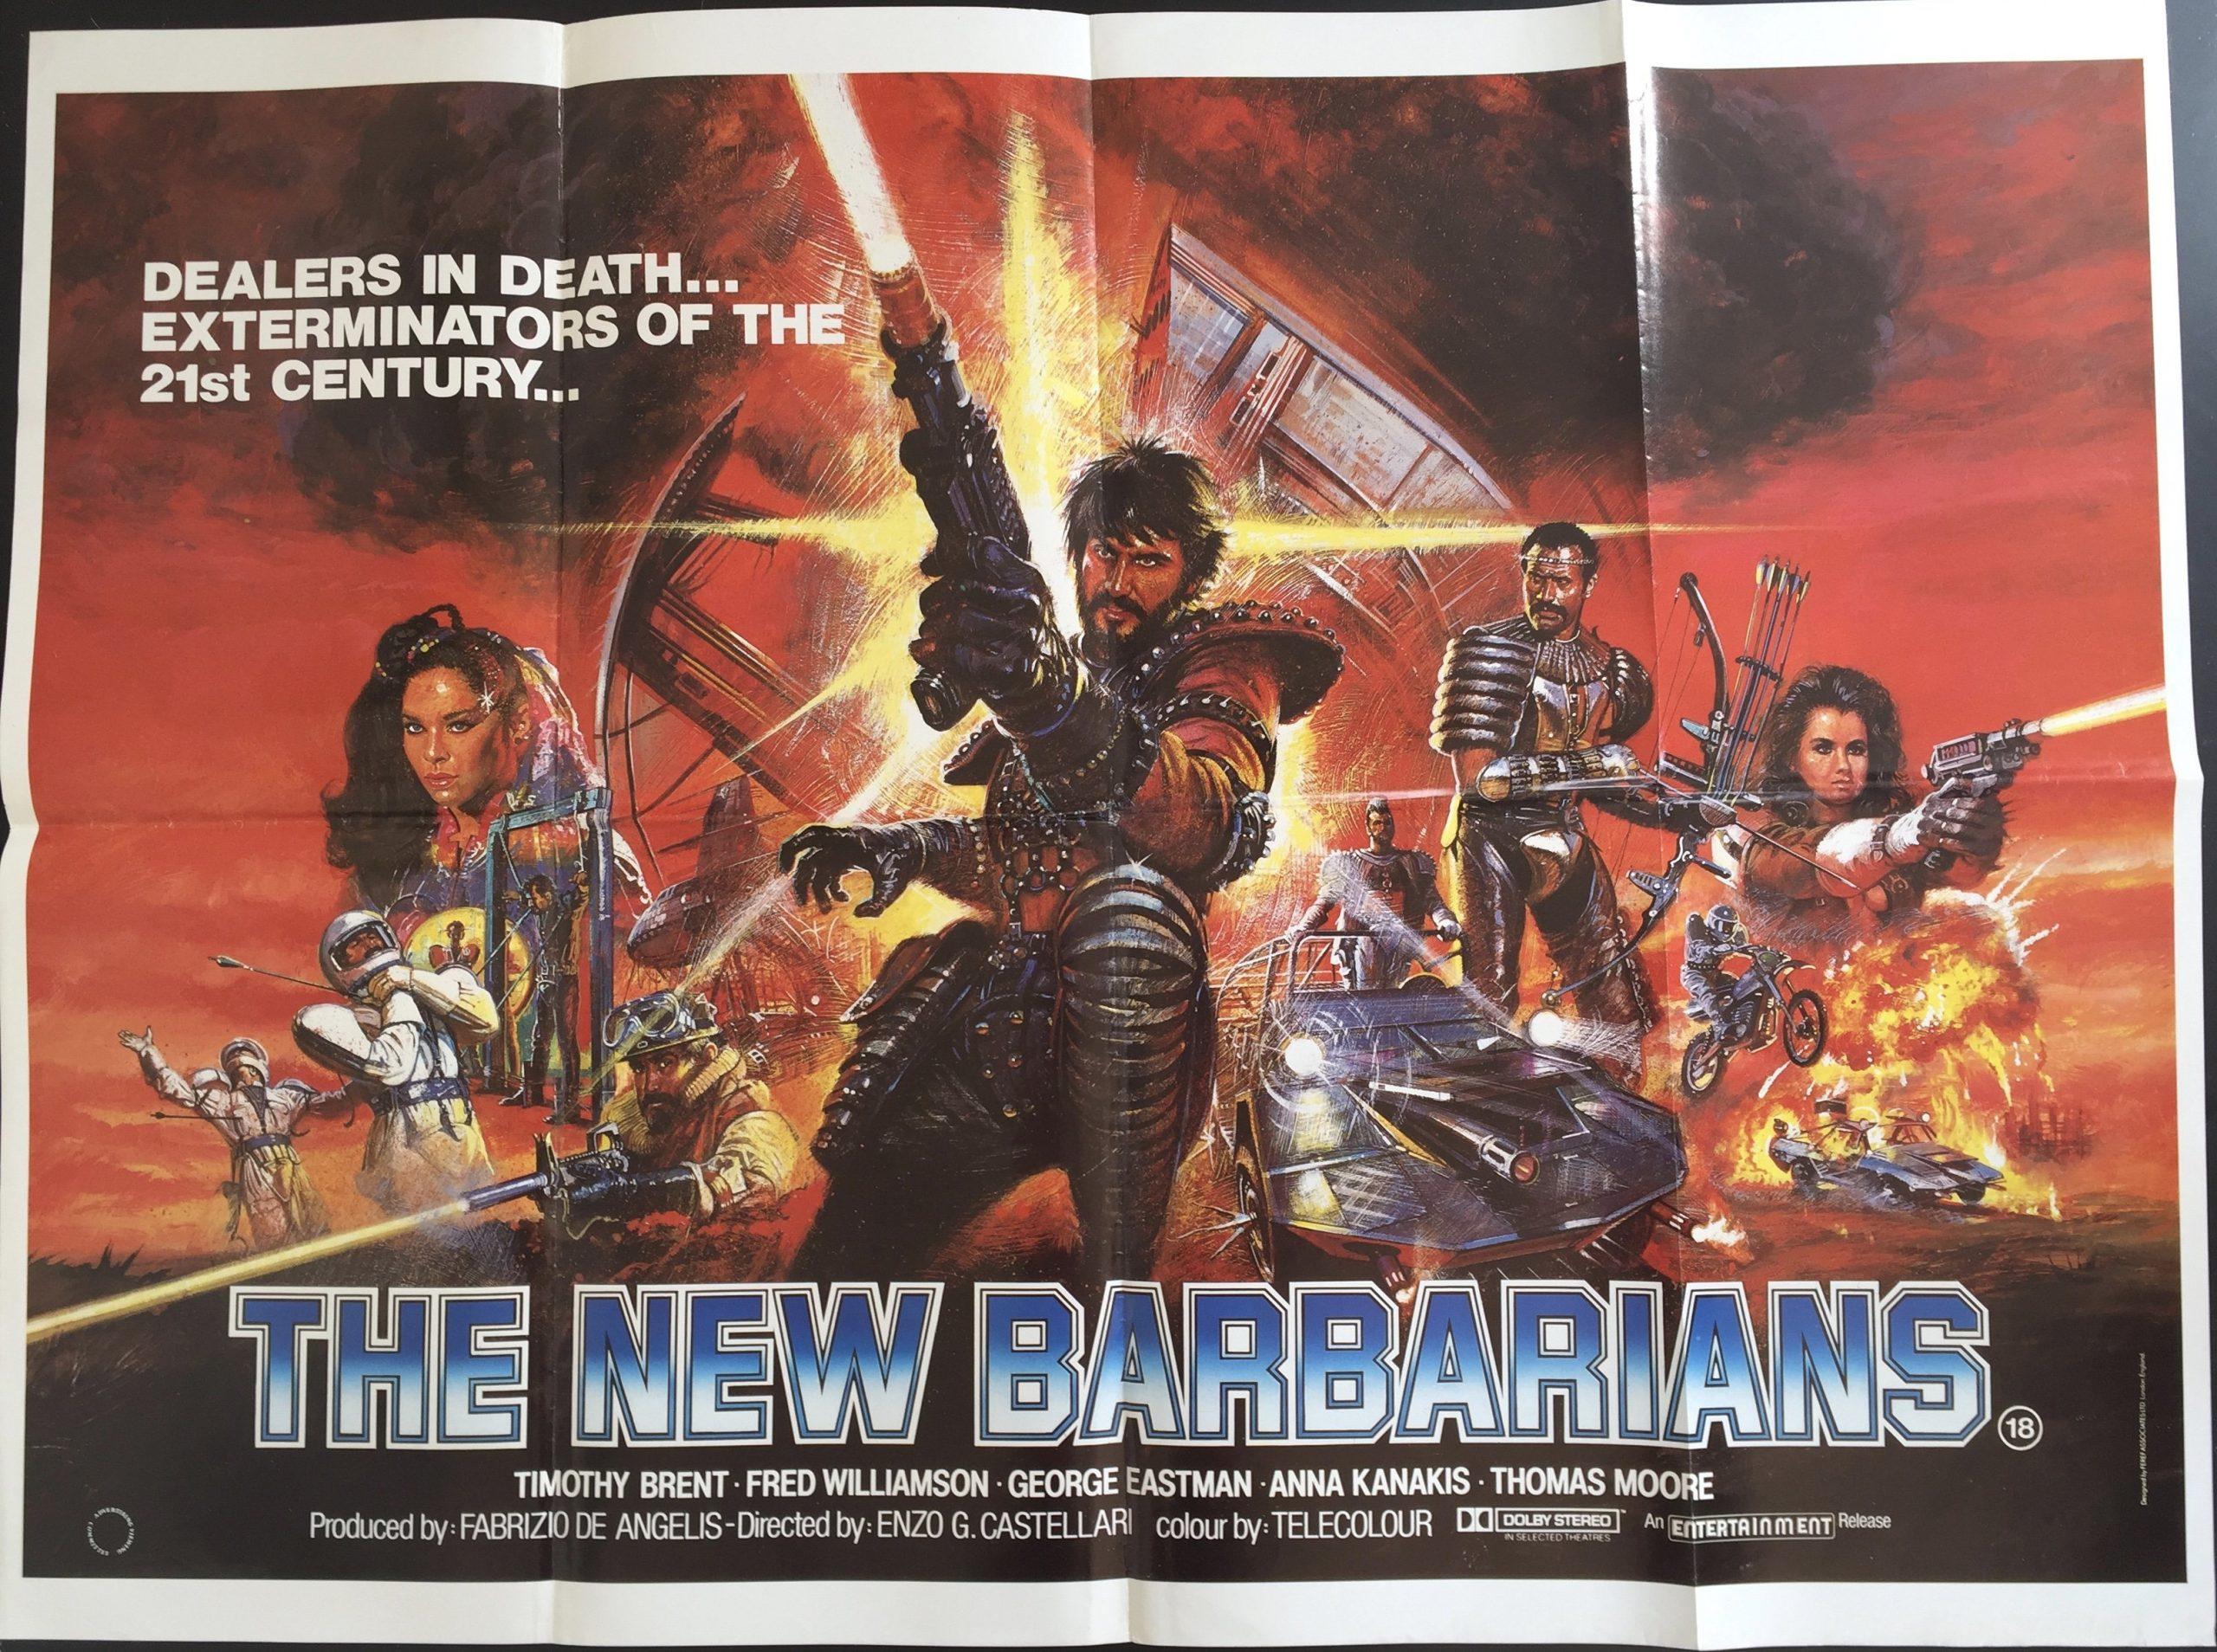 I nuovi barbari The New Barbarians 2019: Новые варвары кадры